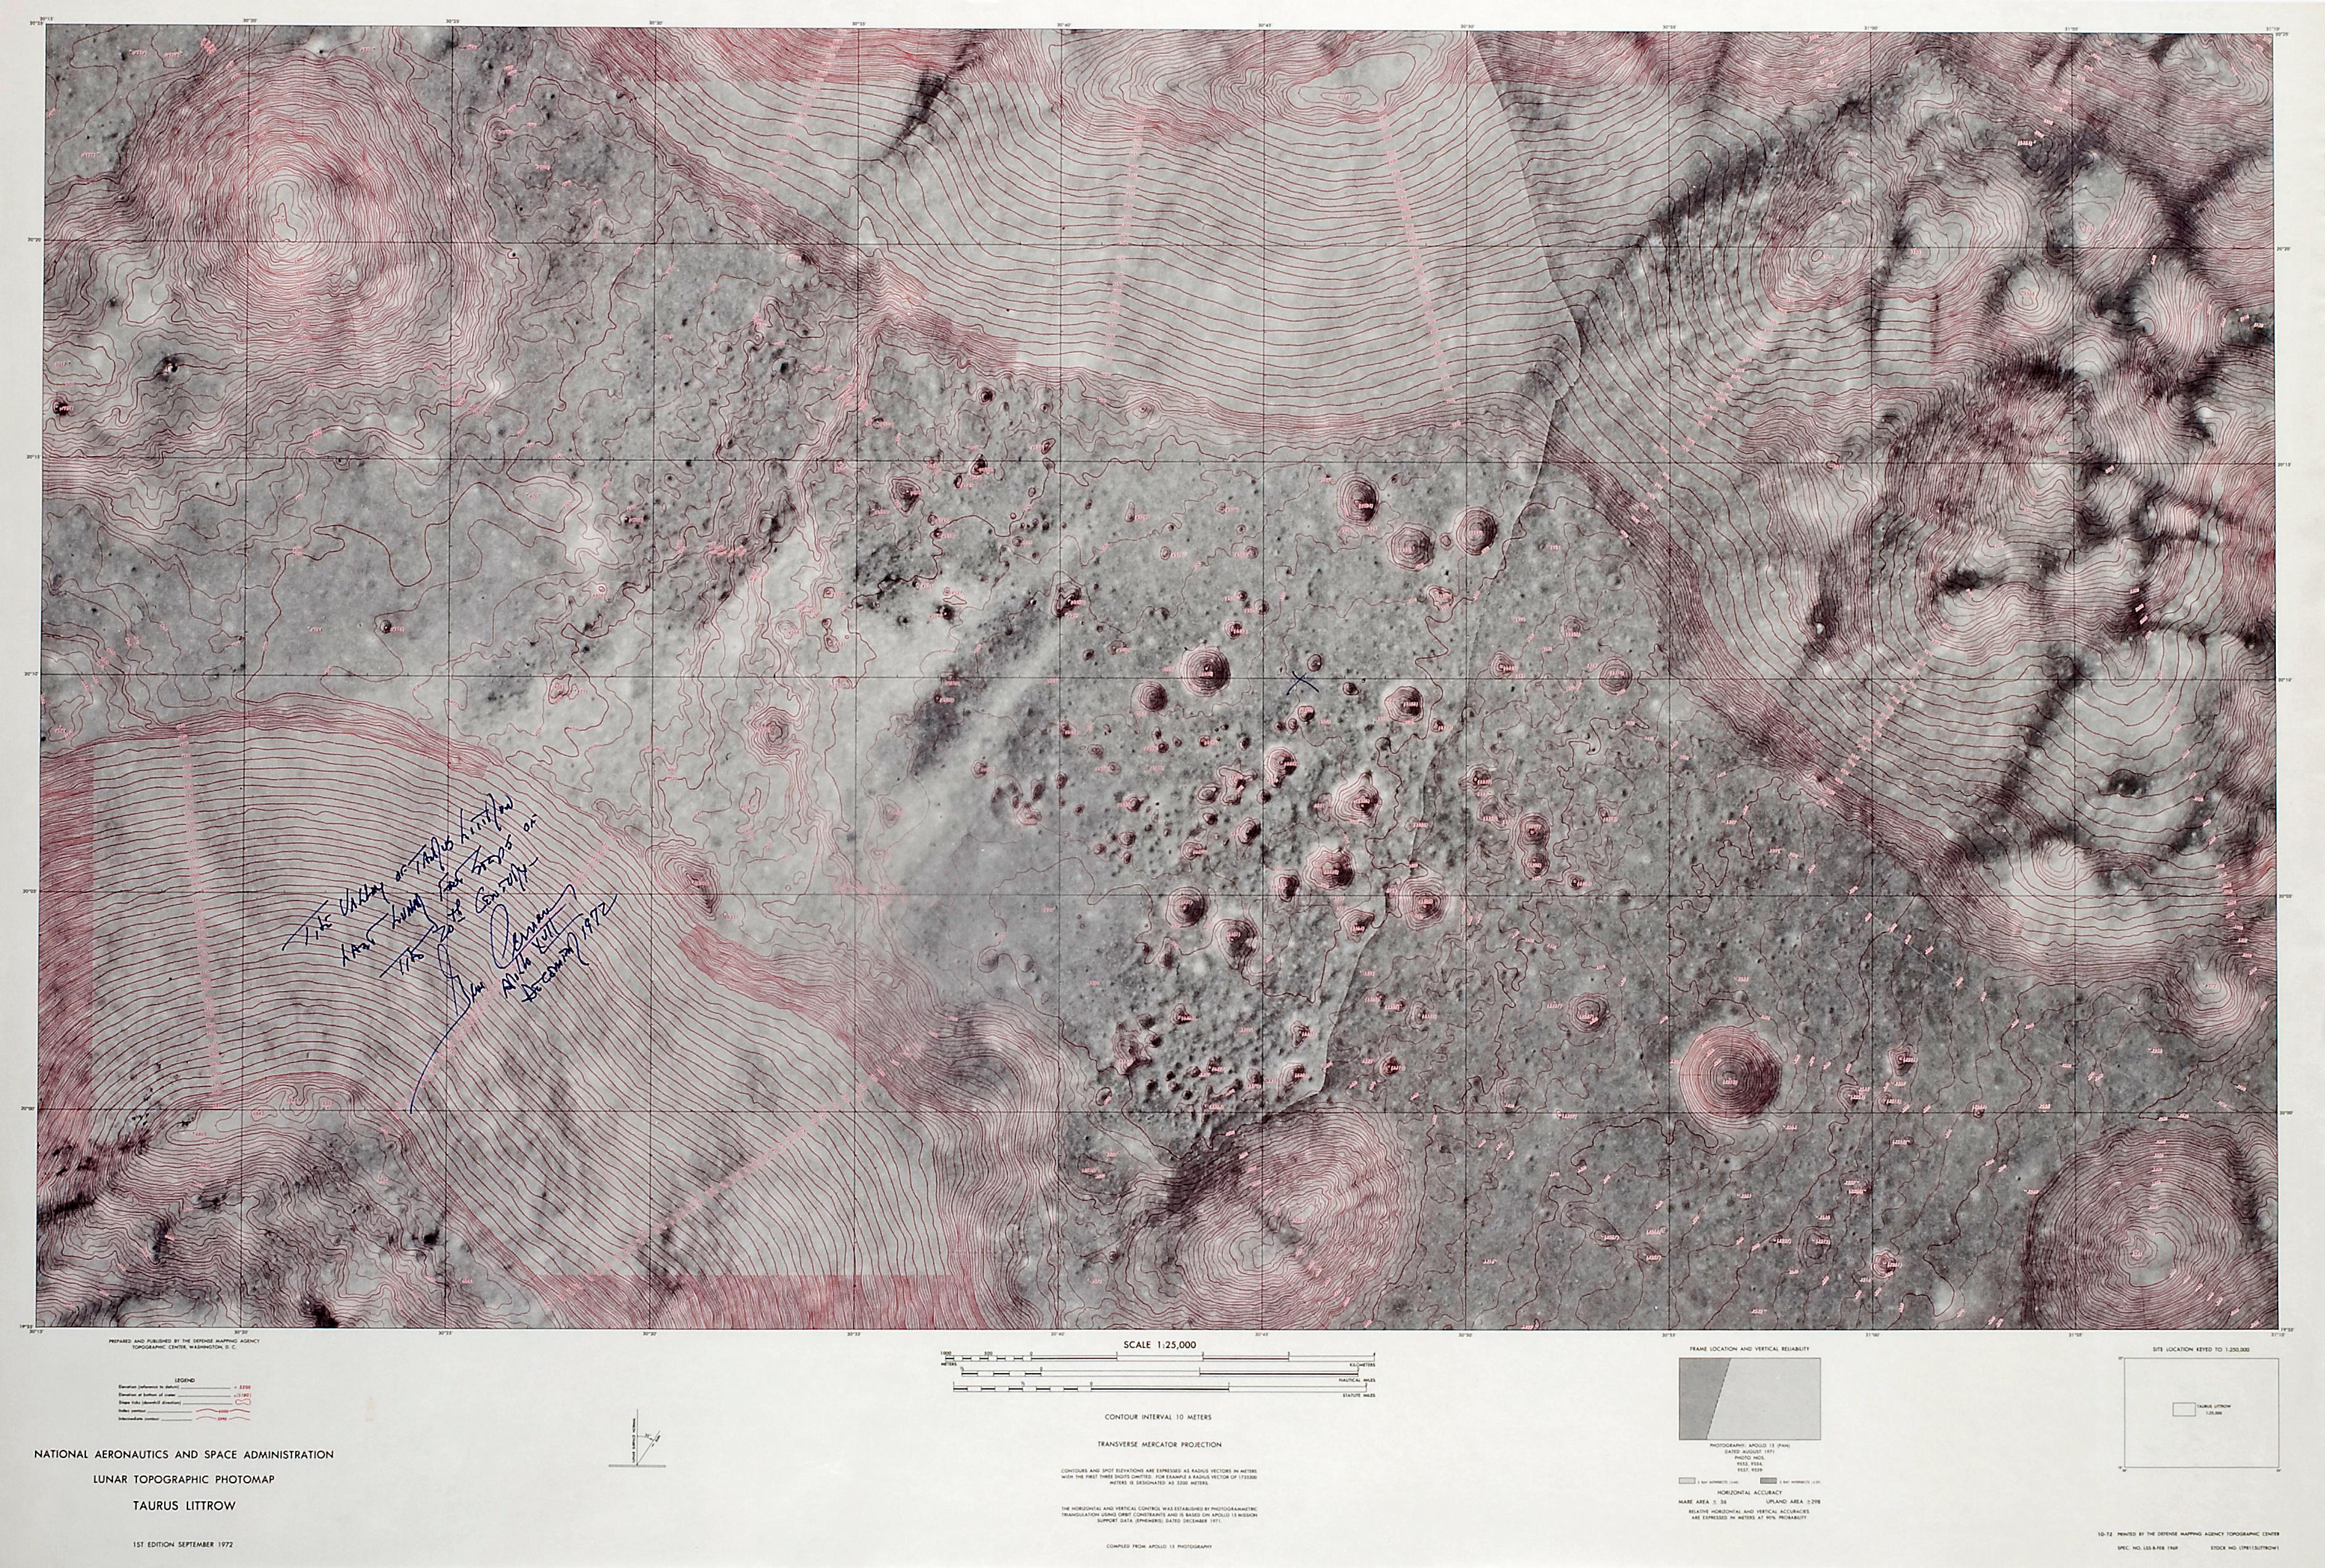 THE APOLLO 17 LANDING SITE—THE LAST LUNAR LANDING OF THE APOLLO PROGRAM.